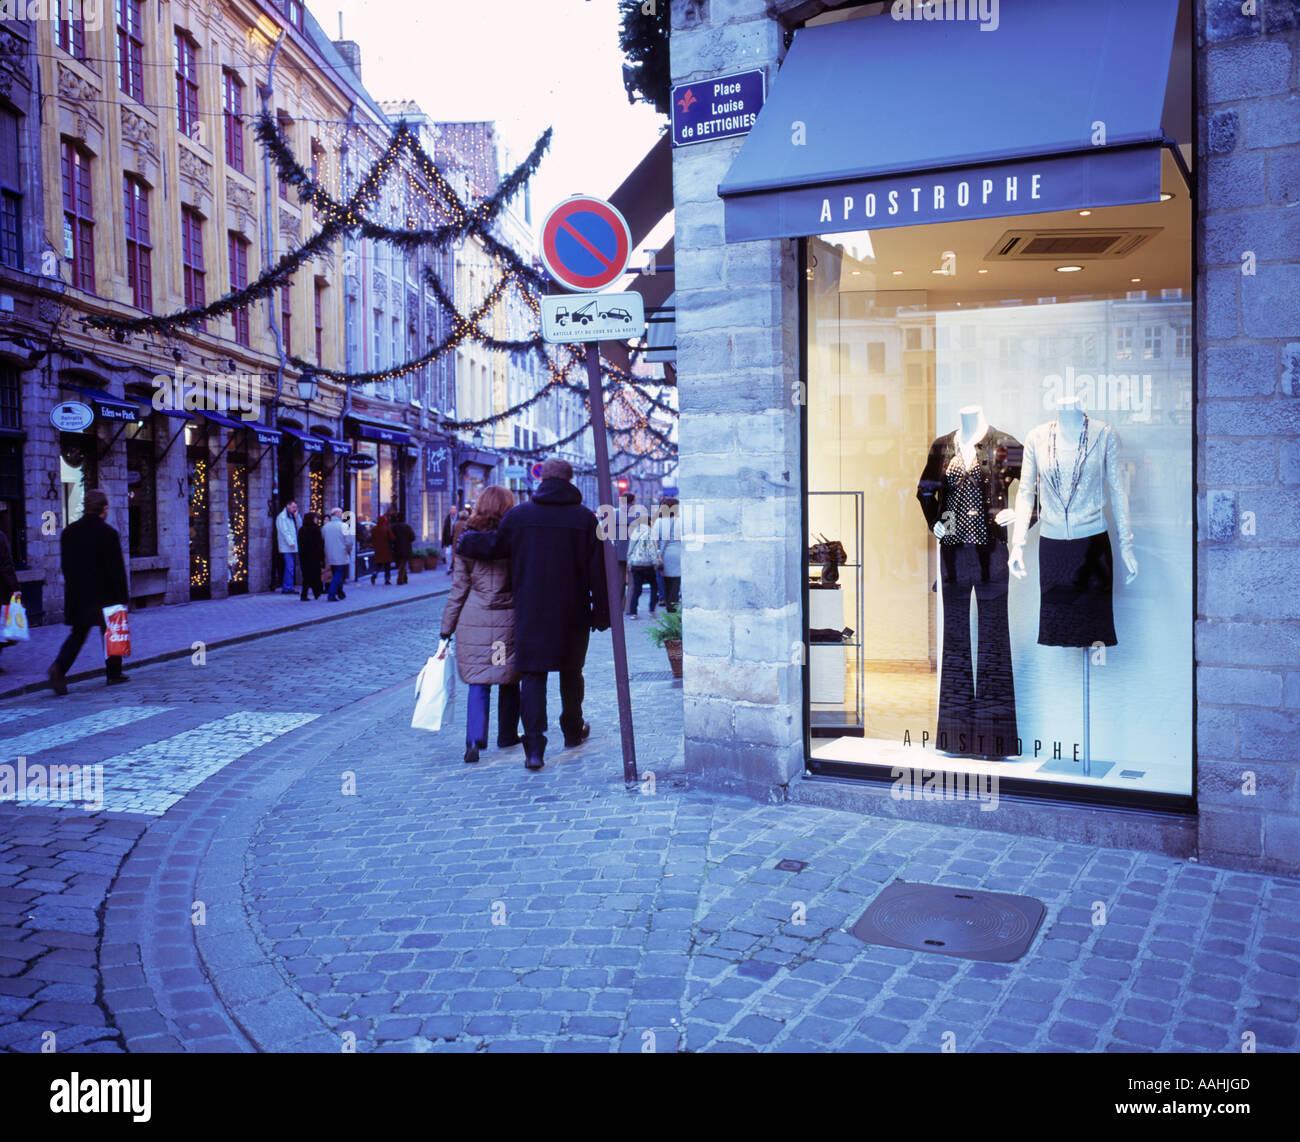 FRANCE NORD/PAS-DE-CALAIS   LILLE VIEUX LILLE   CHRISTMAS SHOPPING - Stock Image